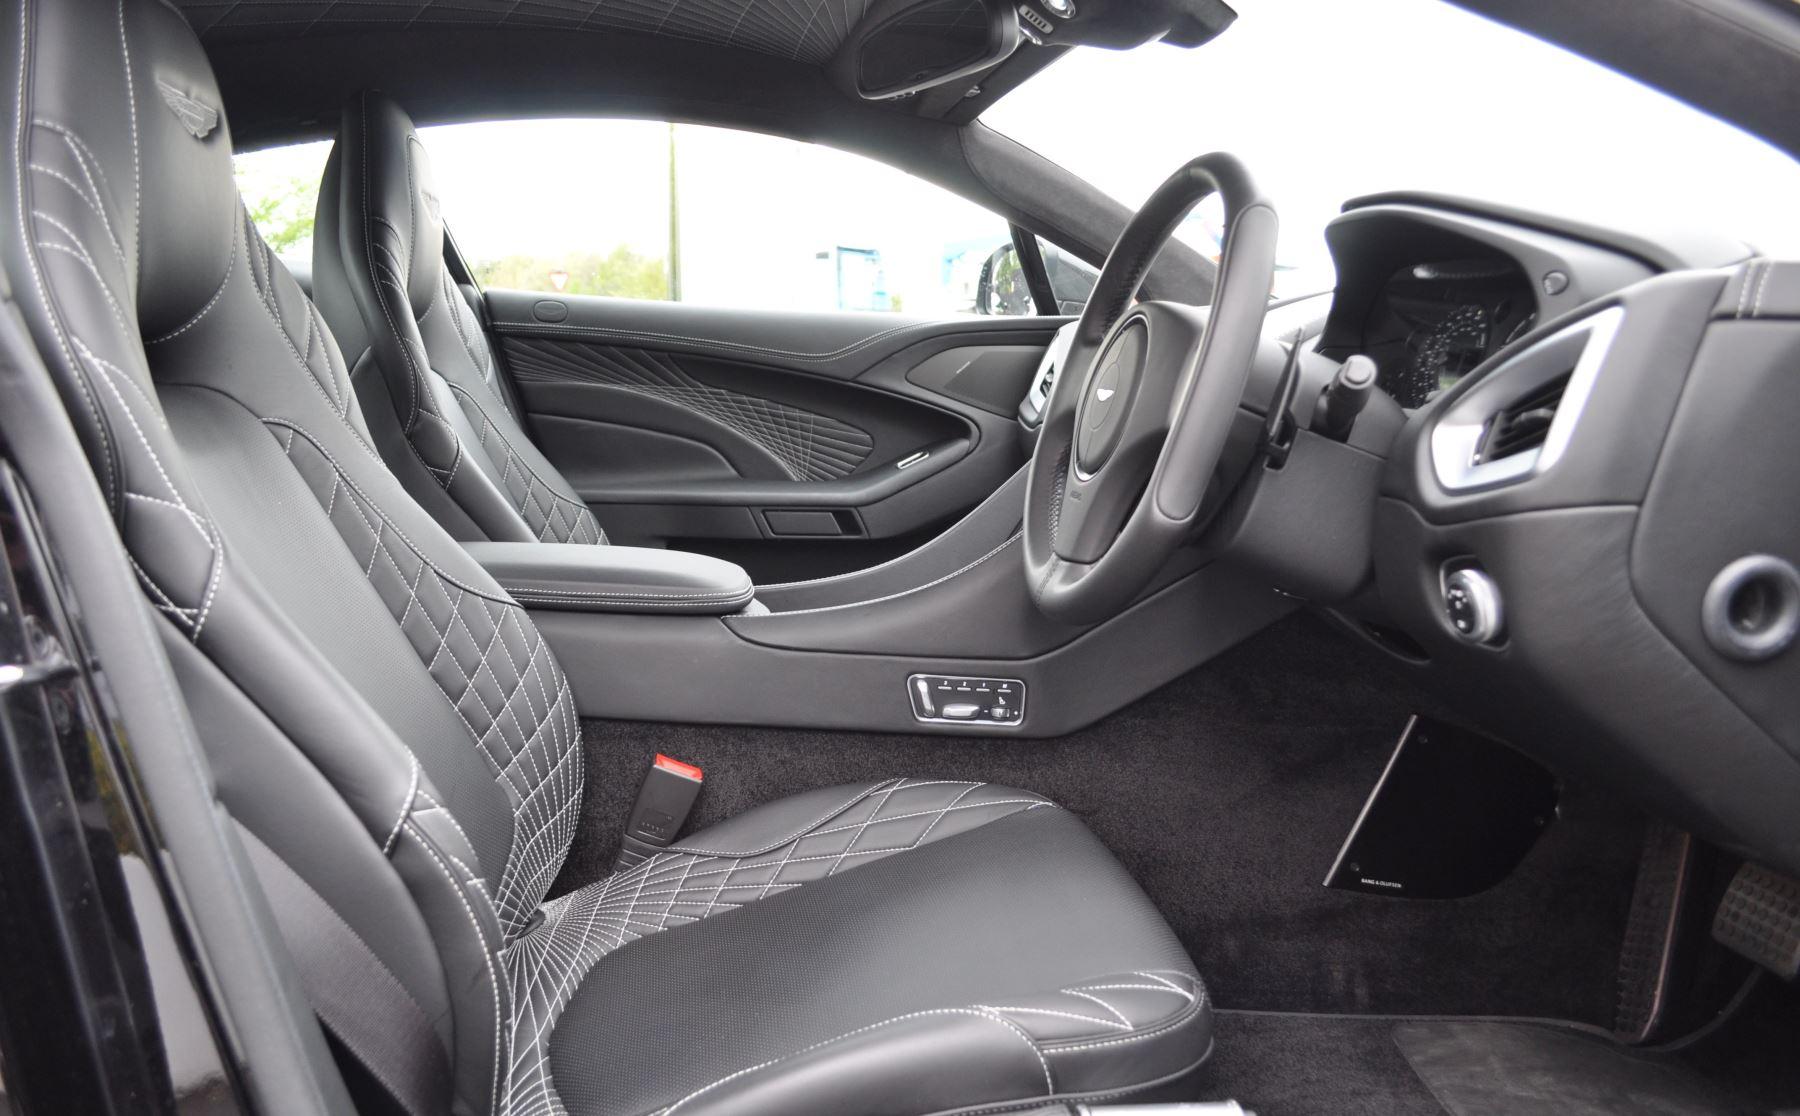 Aston Martin Vanquish S V12 [595] S 2+2 2dr Touchtronic image 25